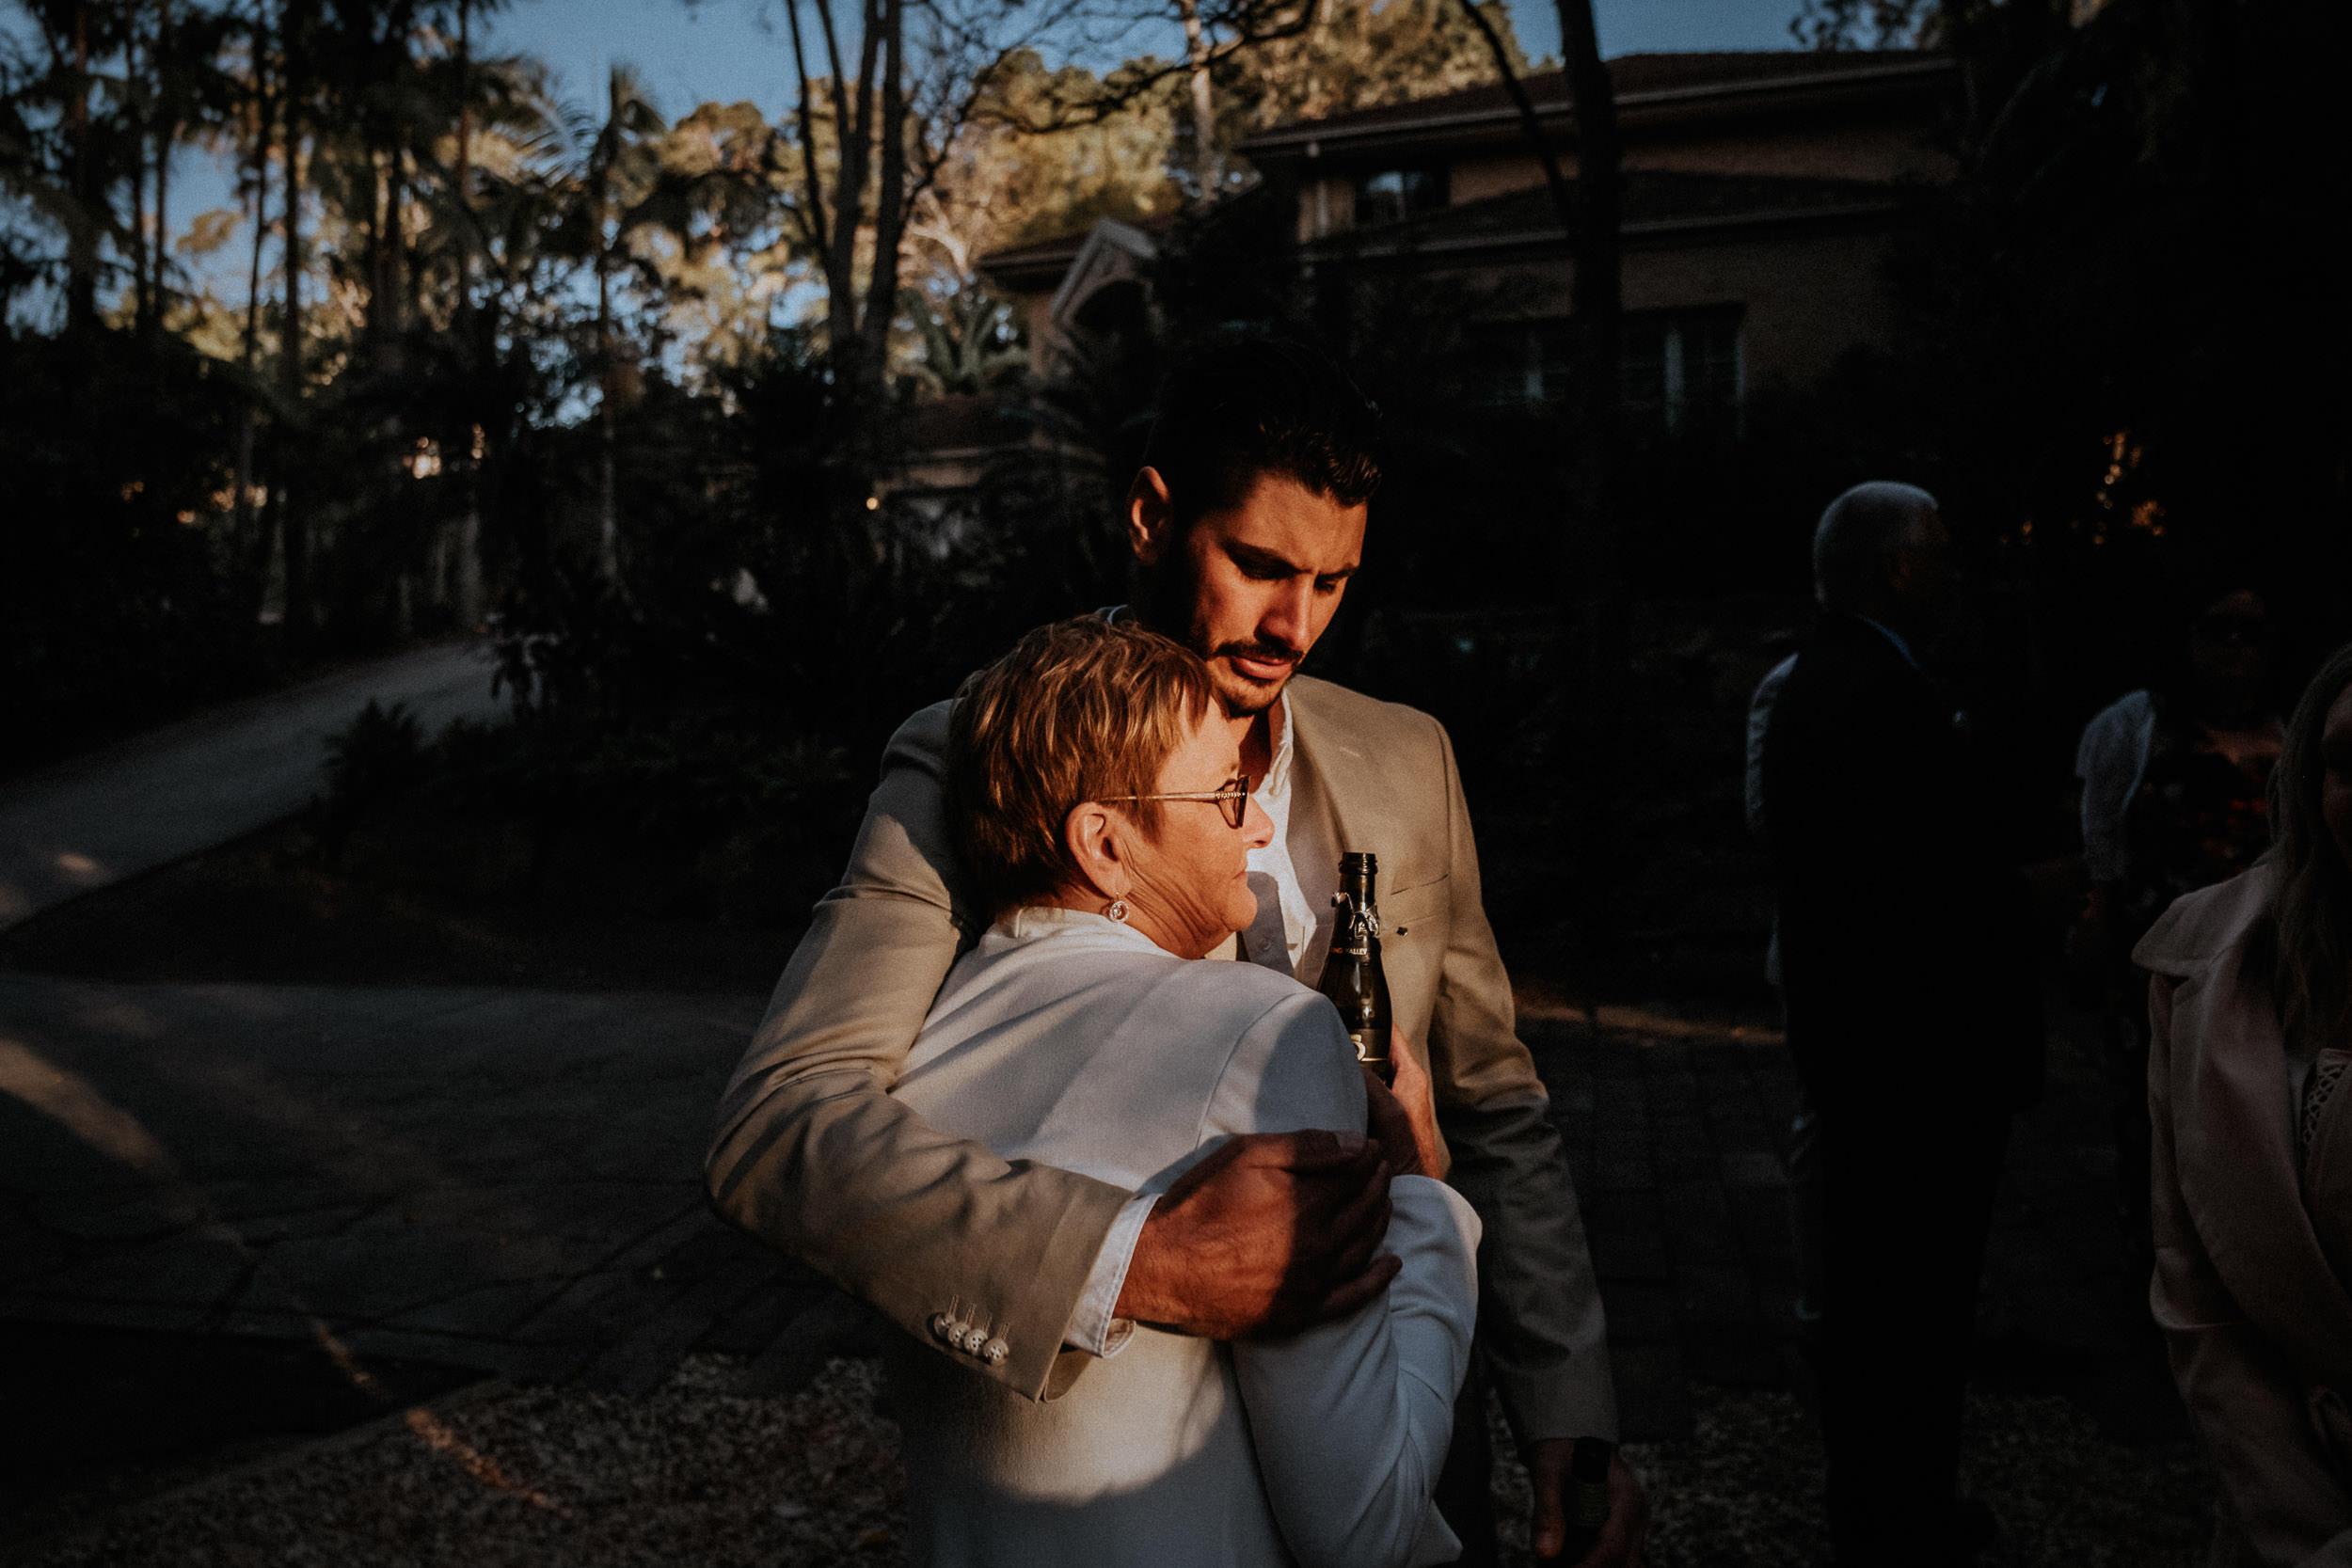 S&A Elopement - Kings & Thieves - Shred 'Til Dead - Central Coast Beach Forest Wedding - 337.jpg